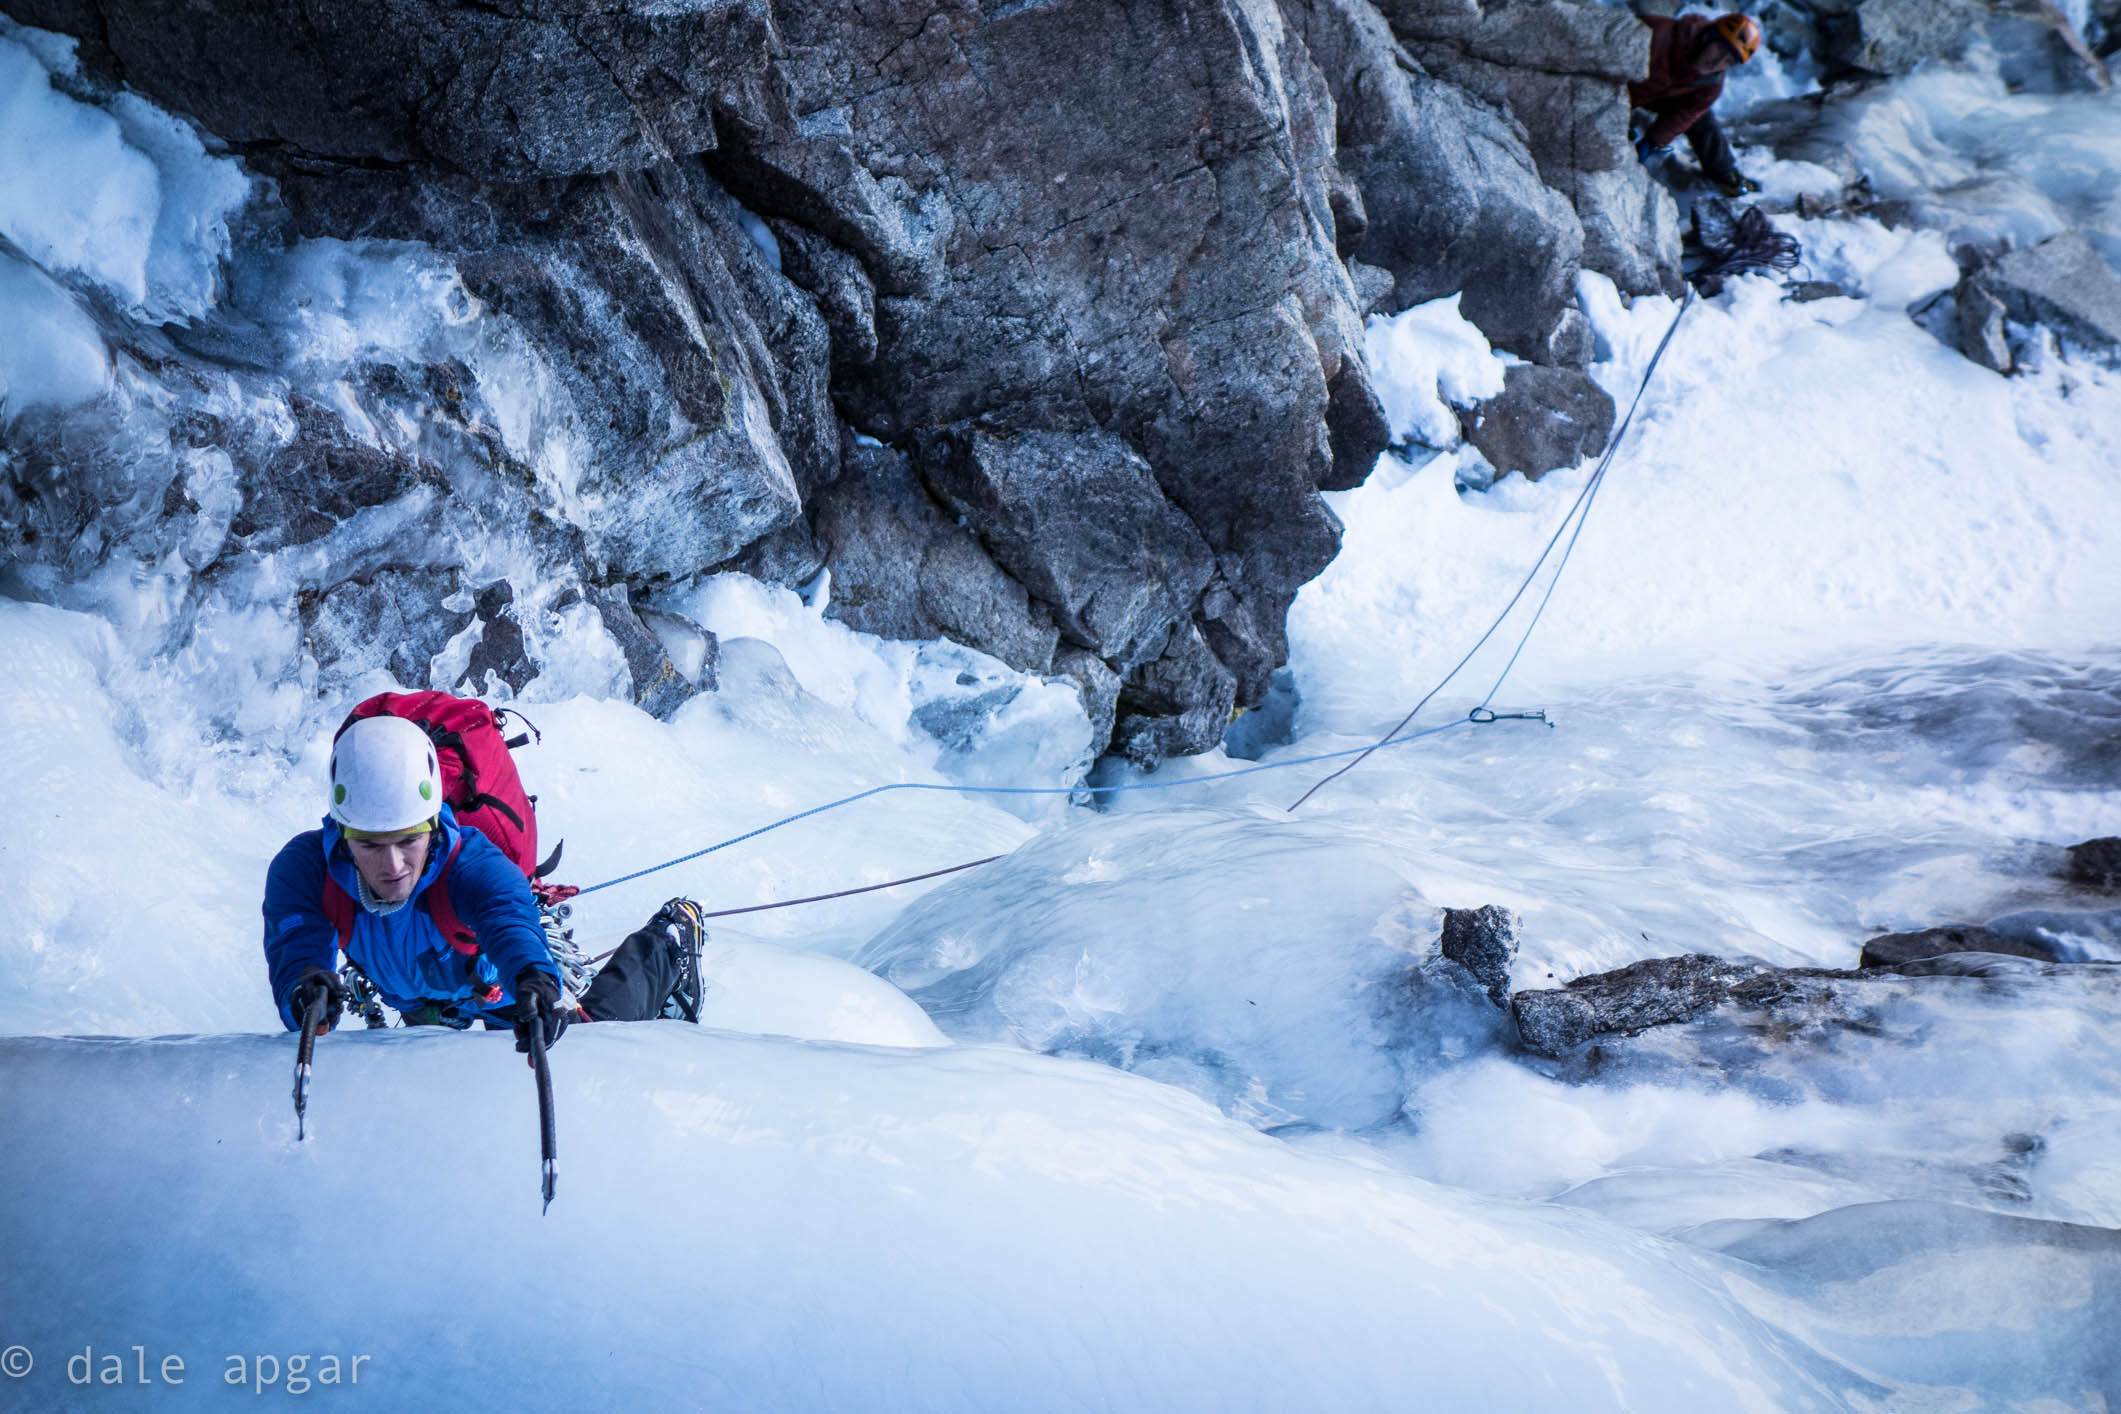 Ian McEleney tackling ice below the Whitney Massif